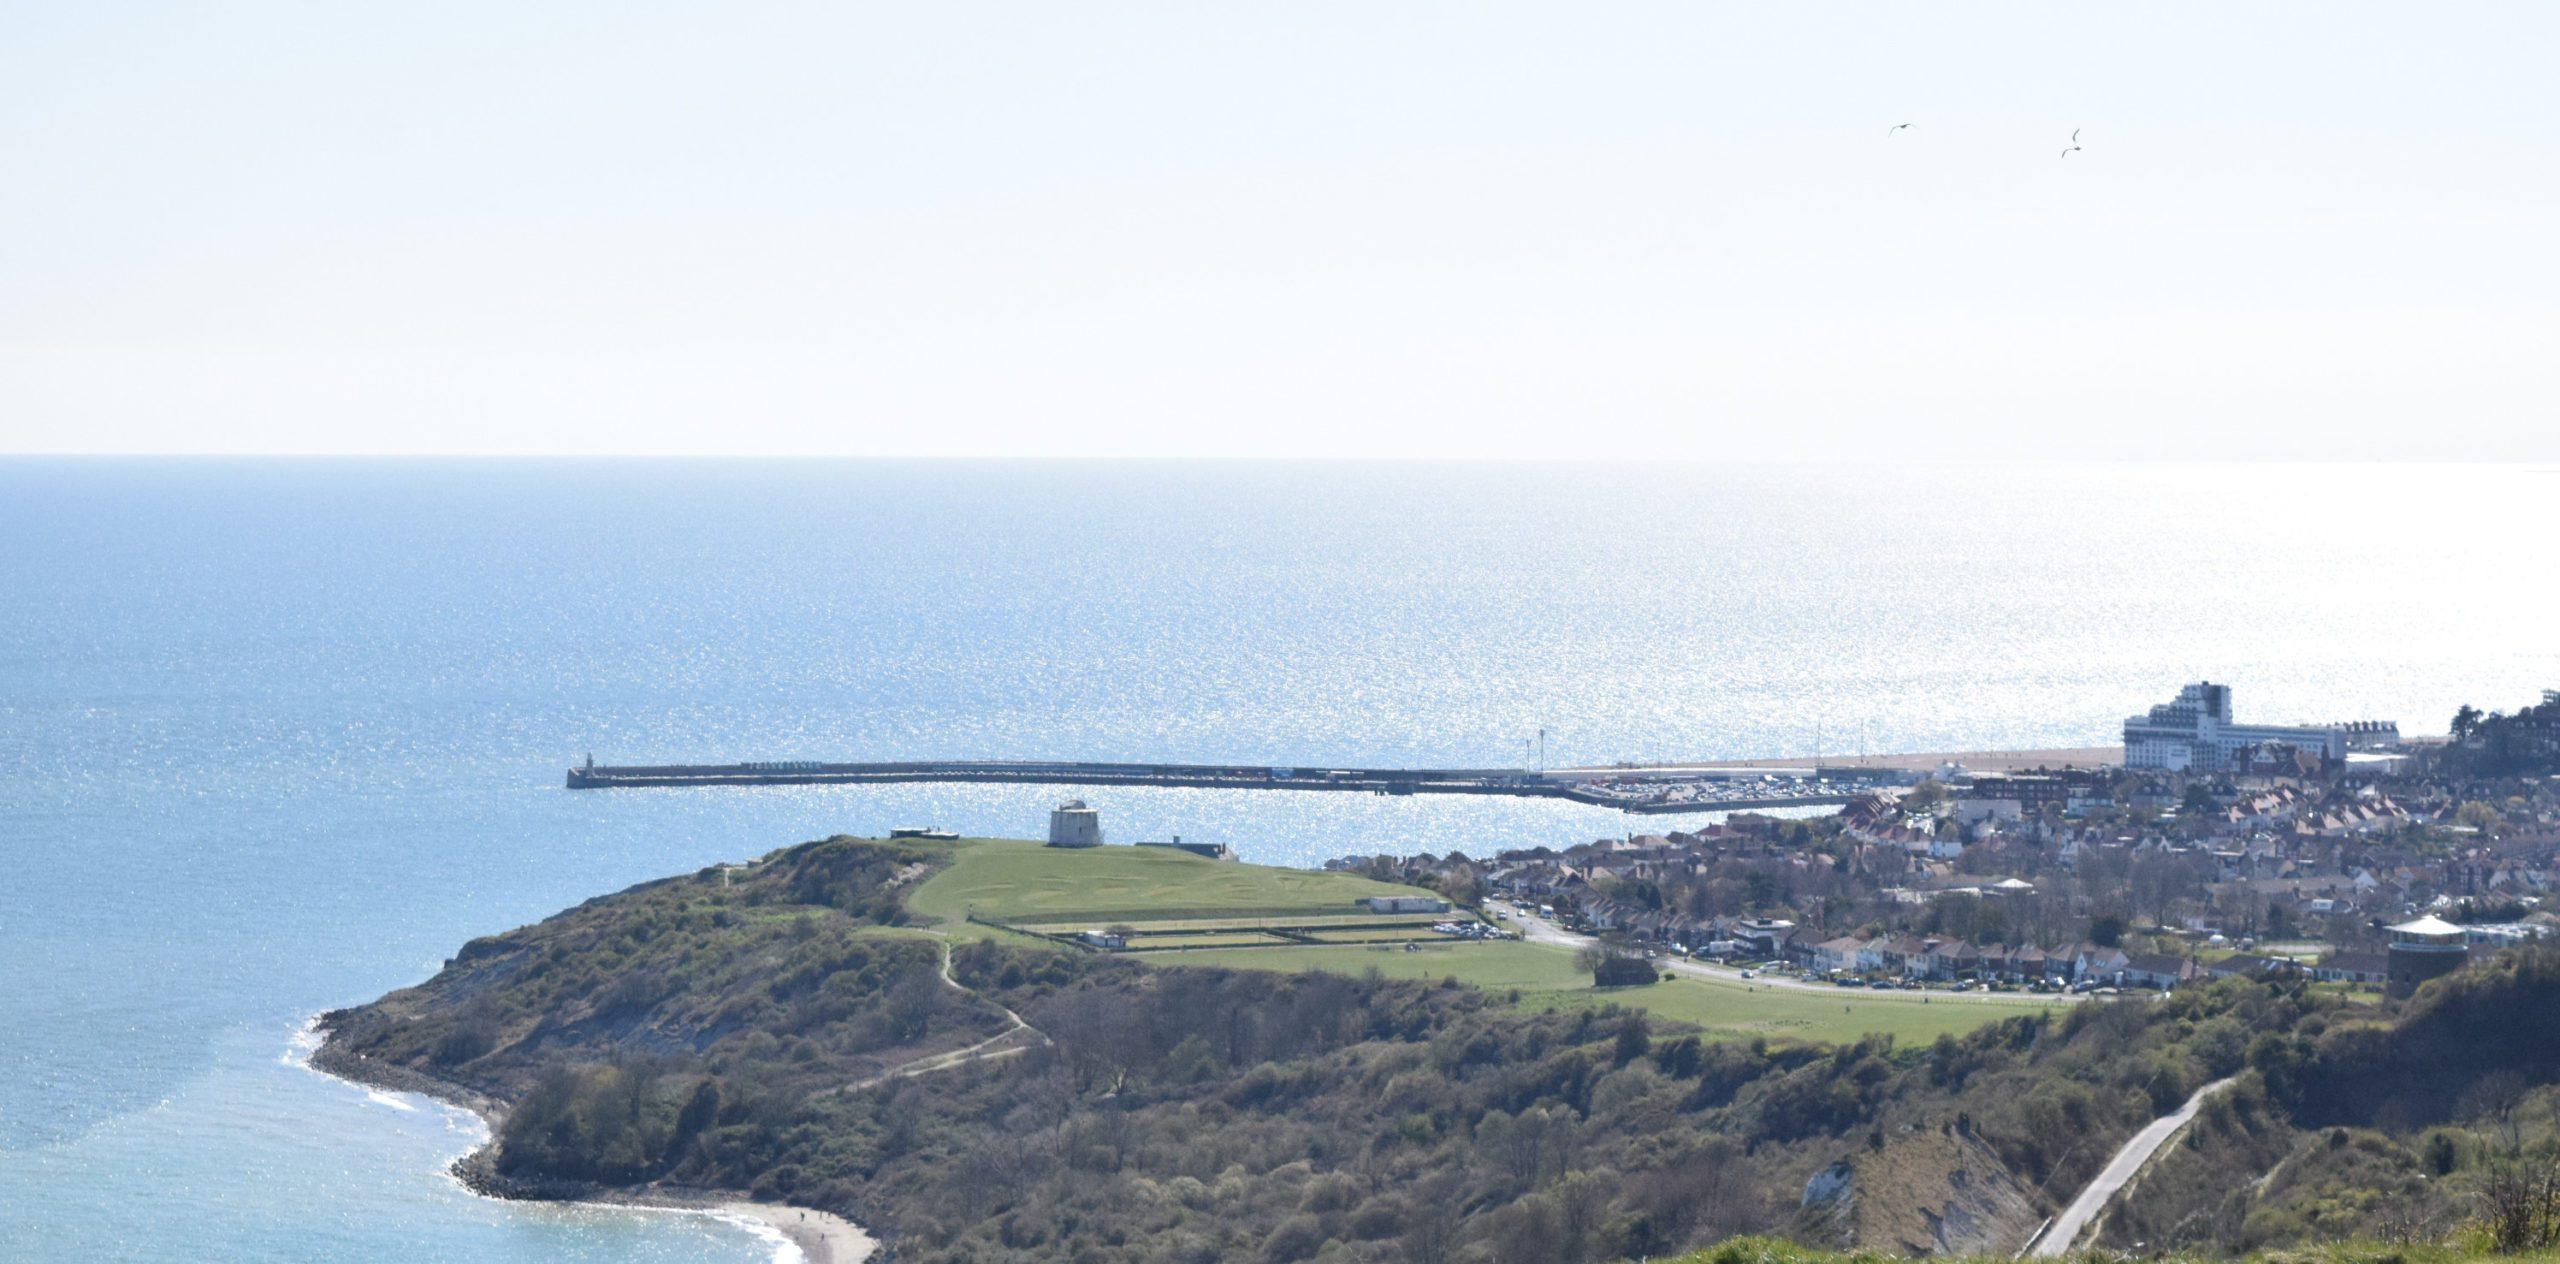 View to Folkestone